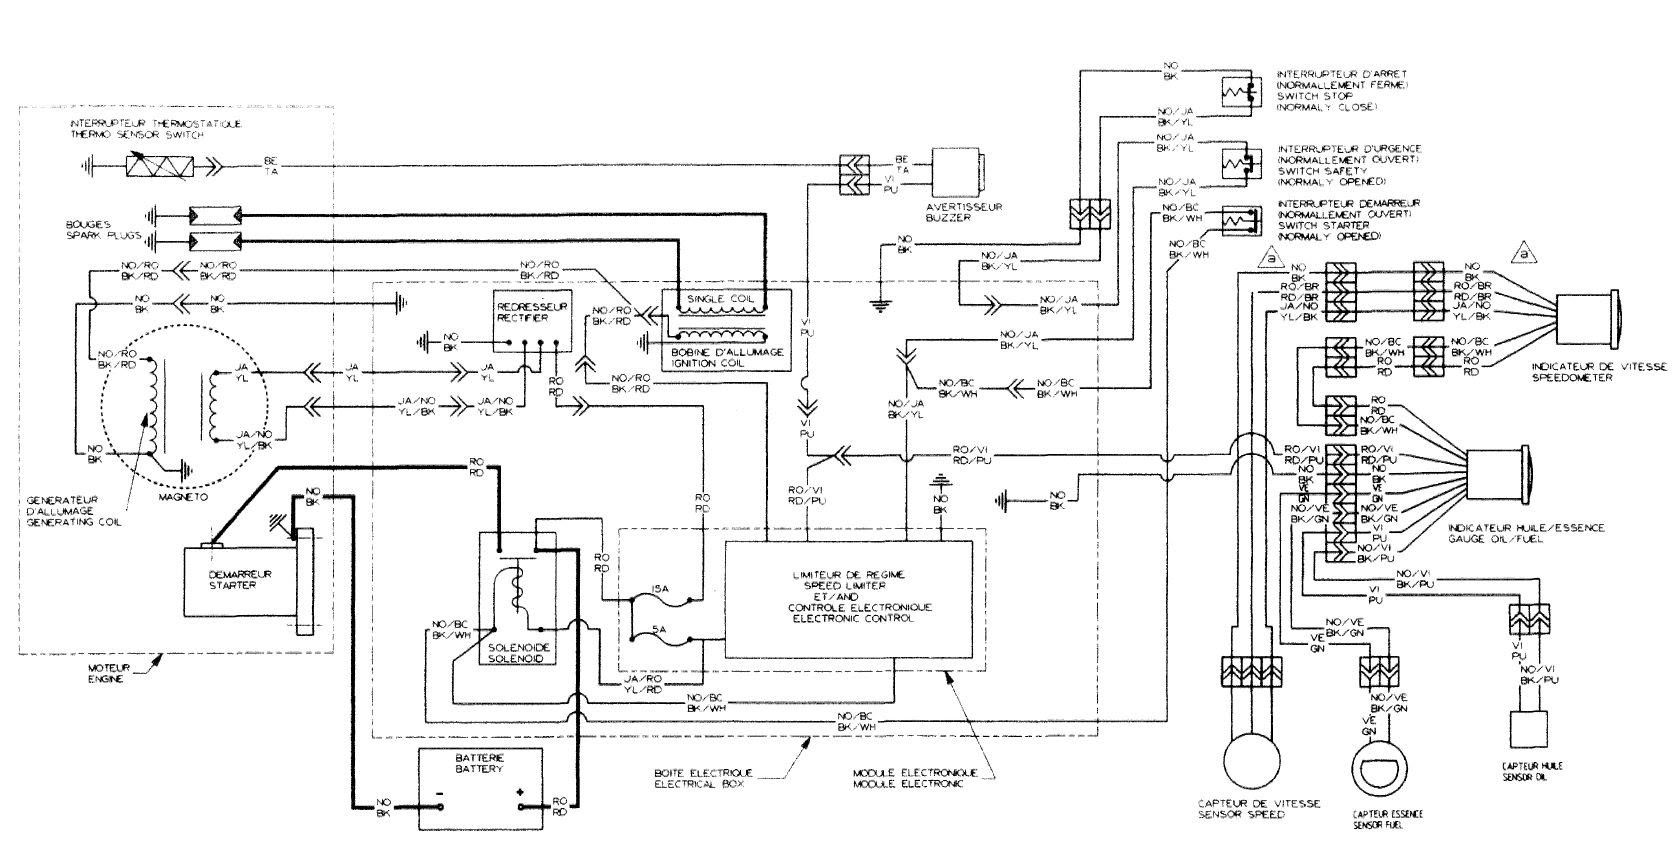 Diagram Sea Doo Starter Wiring Diagrams Full Version Hd Quality Wiring Diagrams Pvdiagramxboxer Facilesicuro It